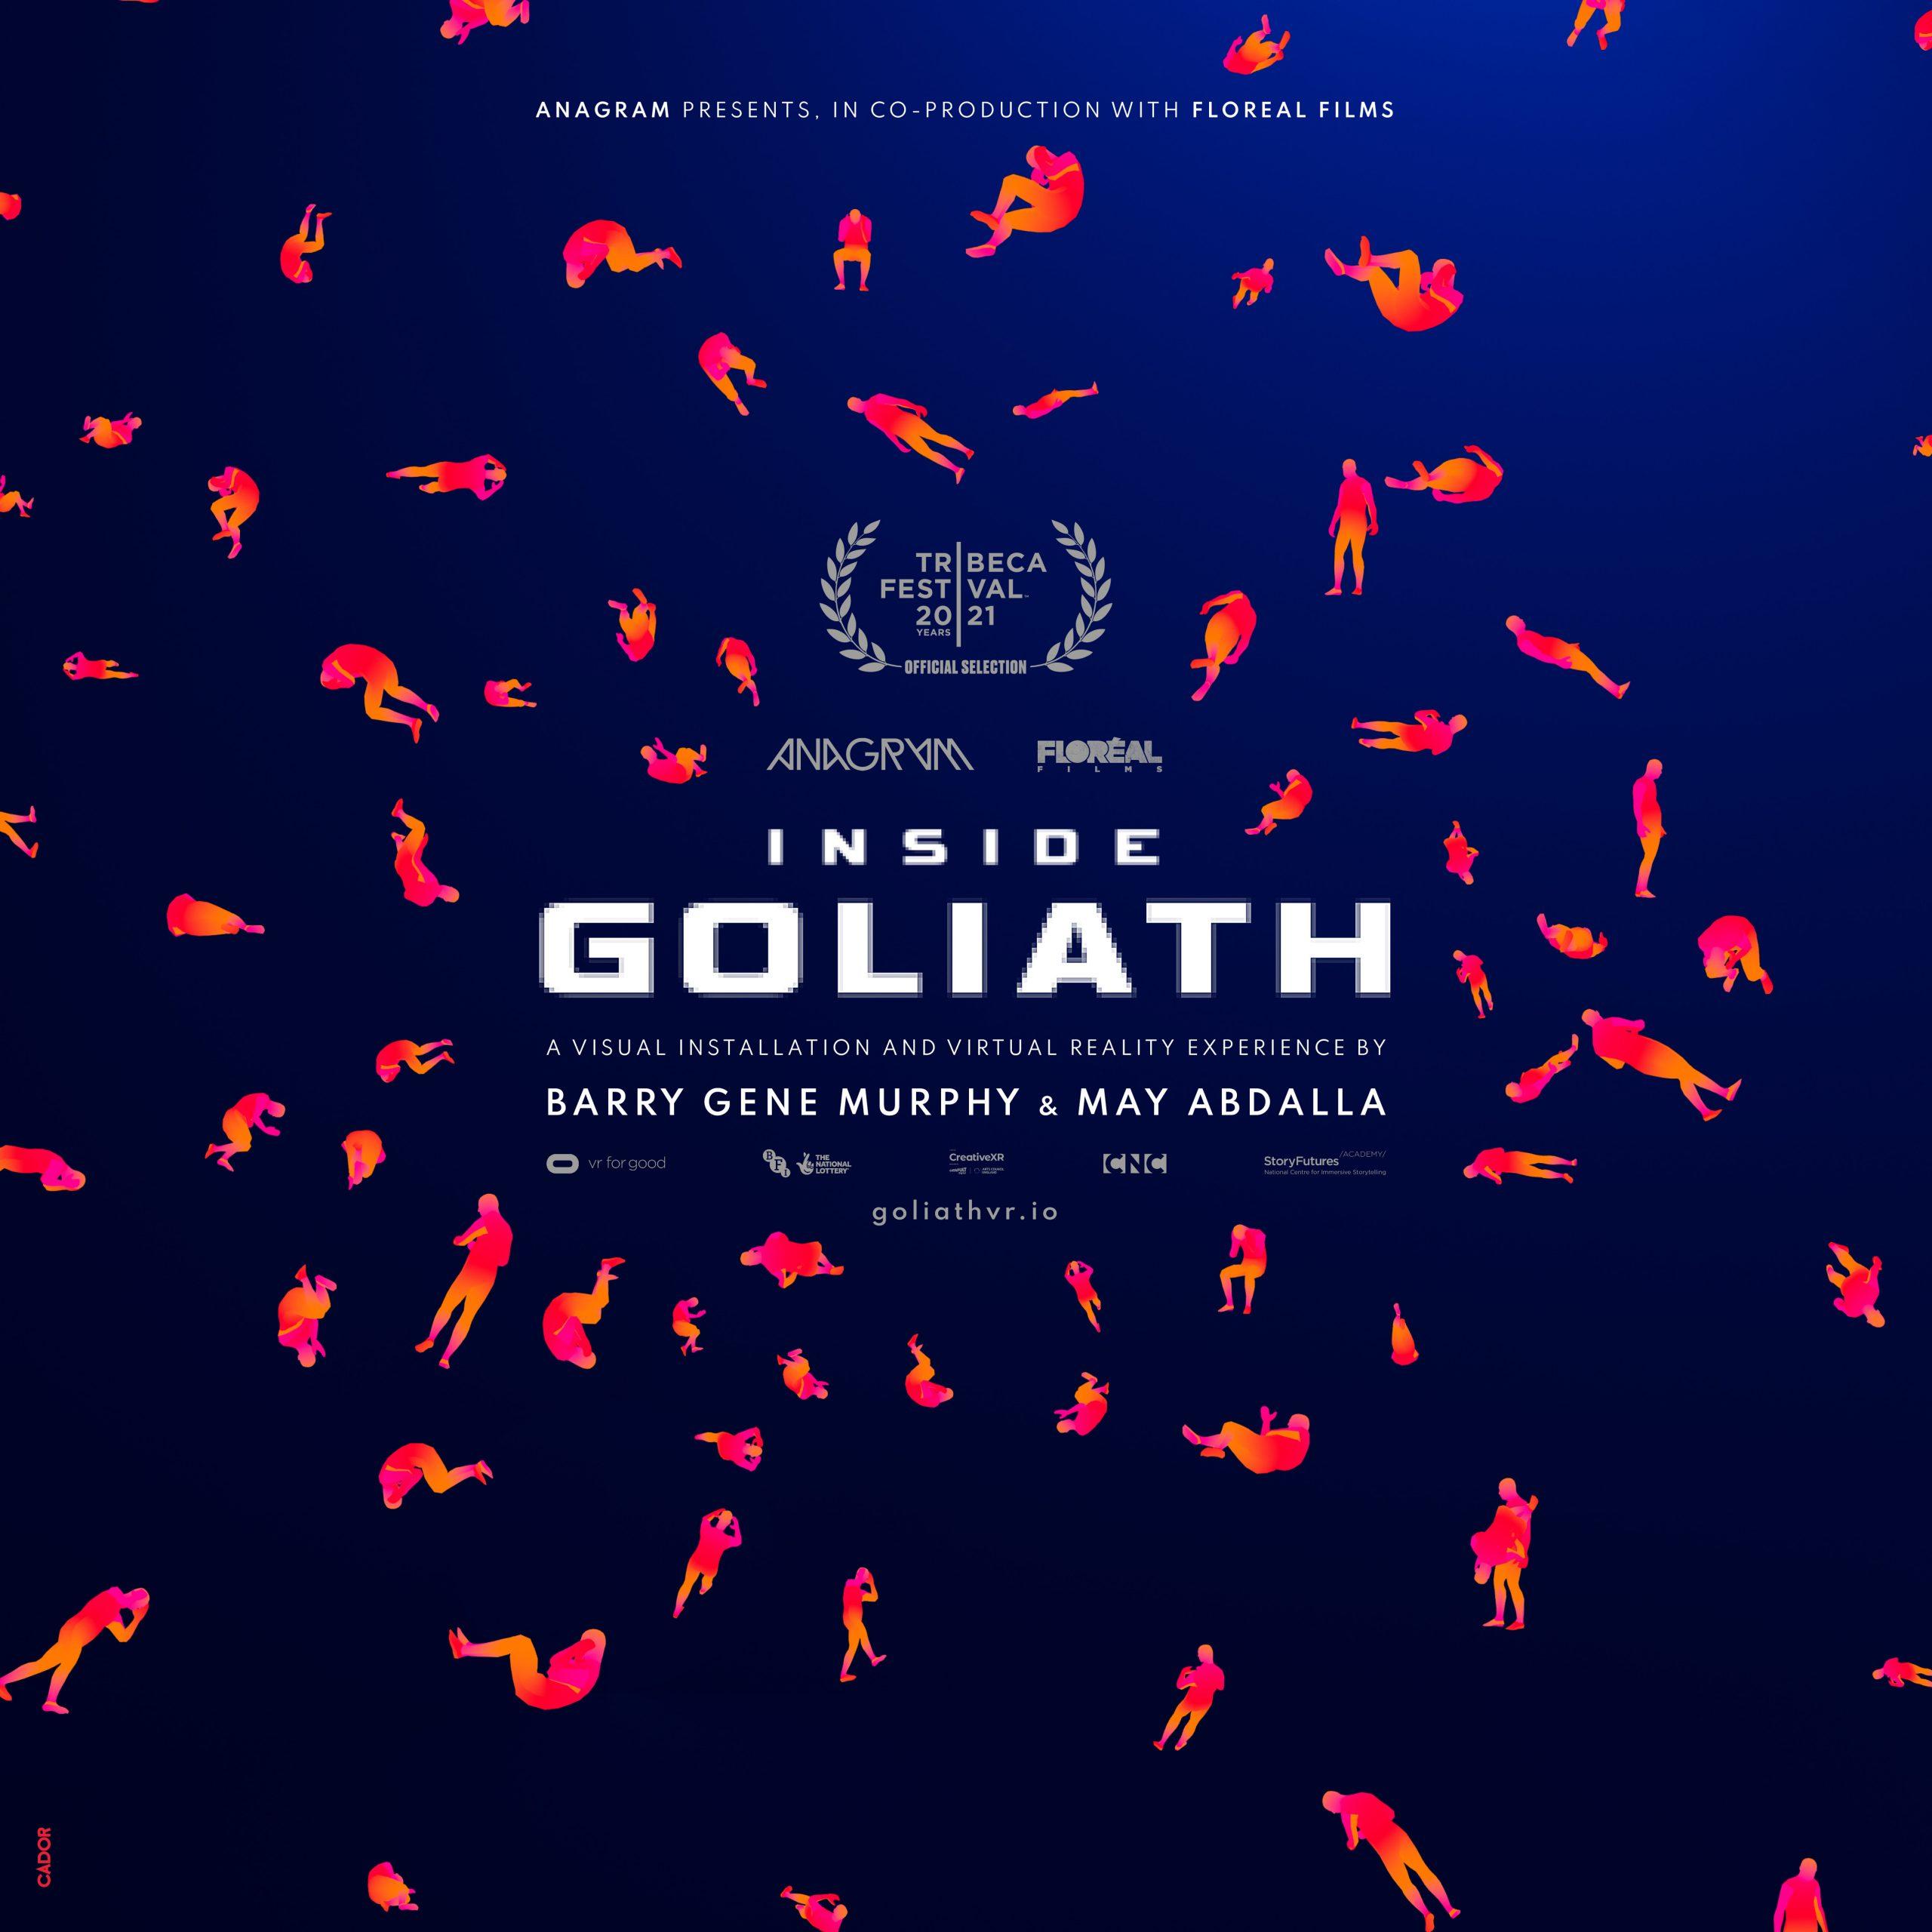 GOLIATH_INSTA_1080X1080_2